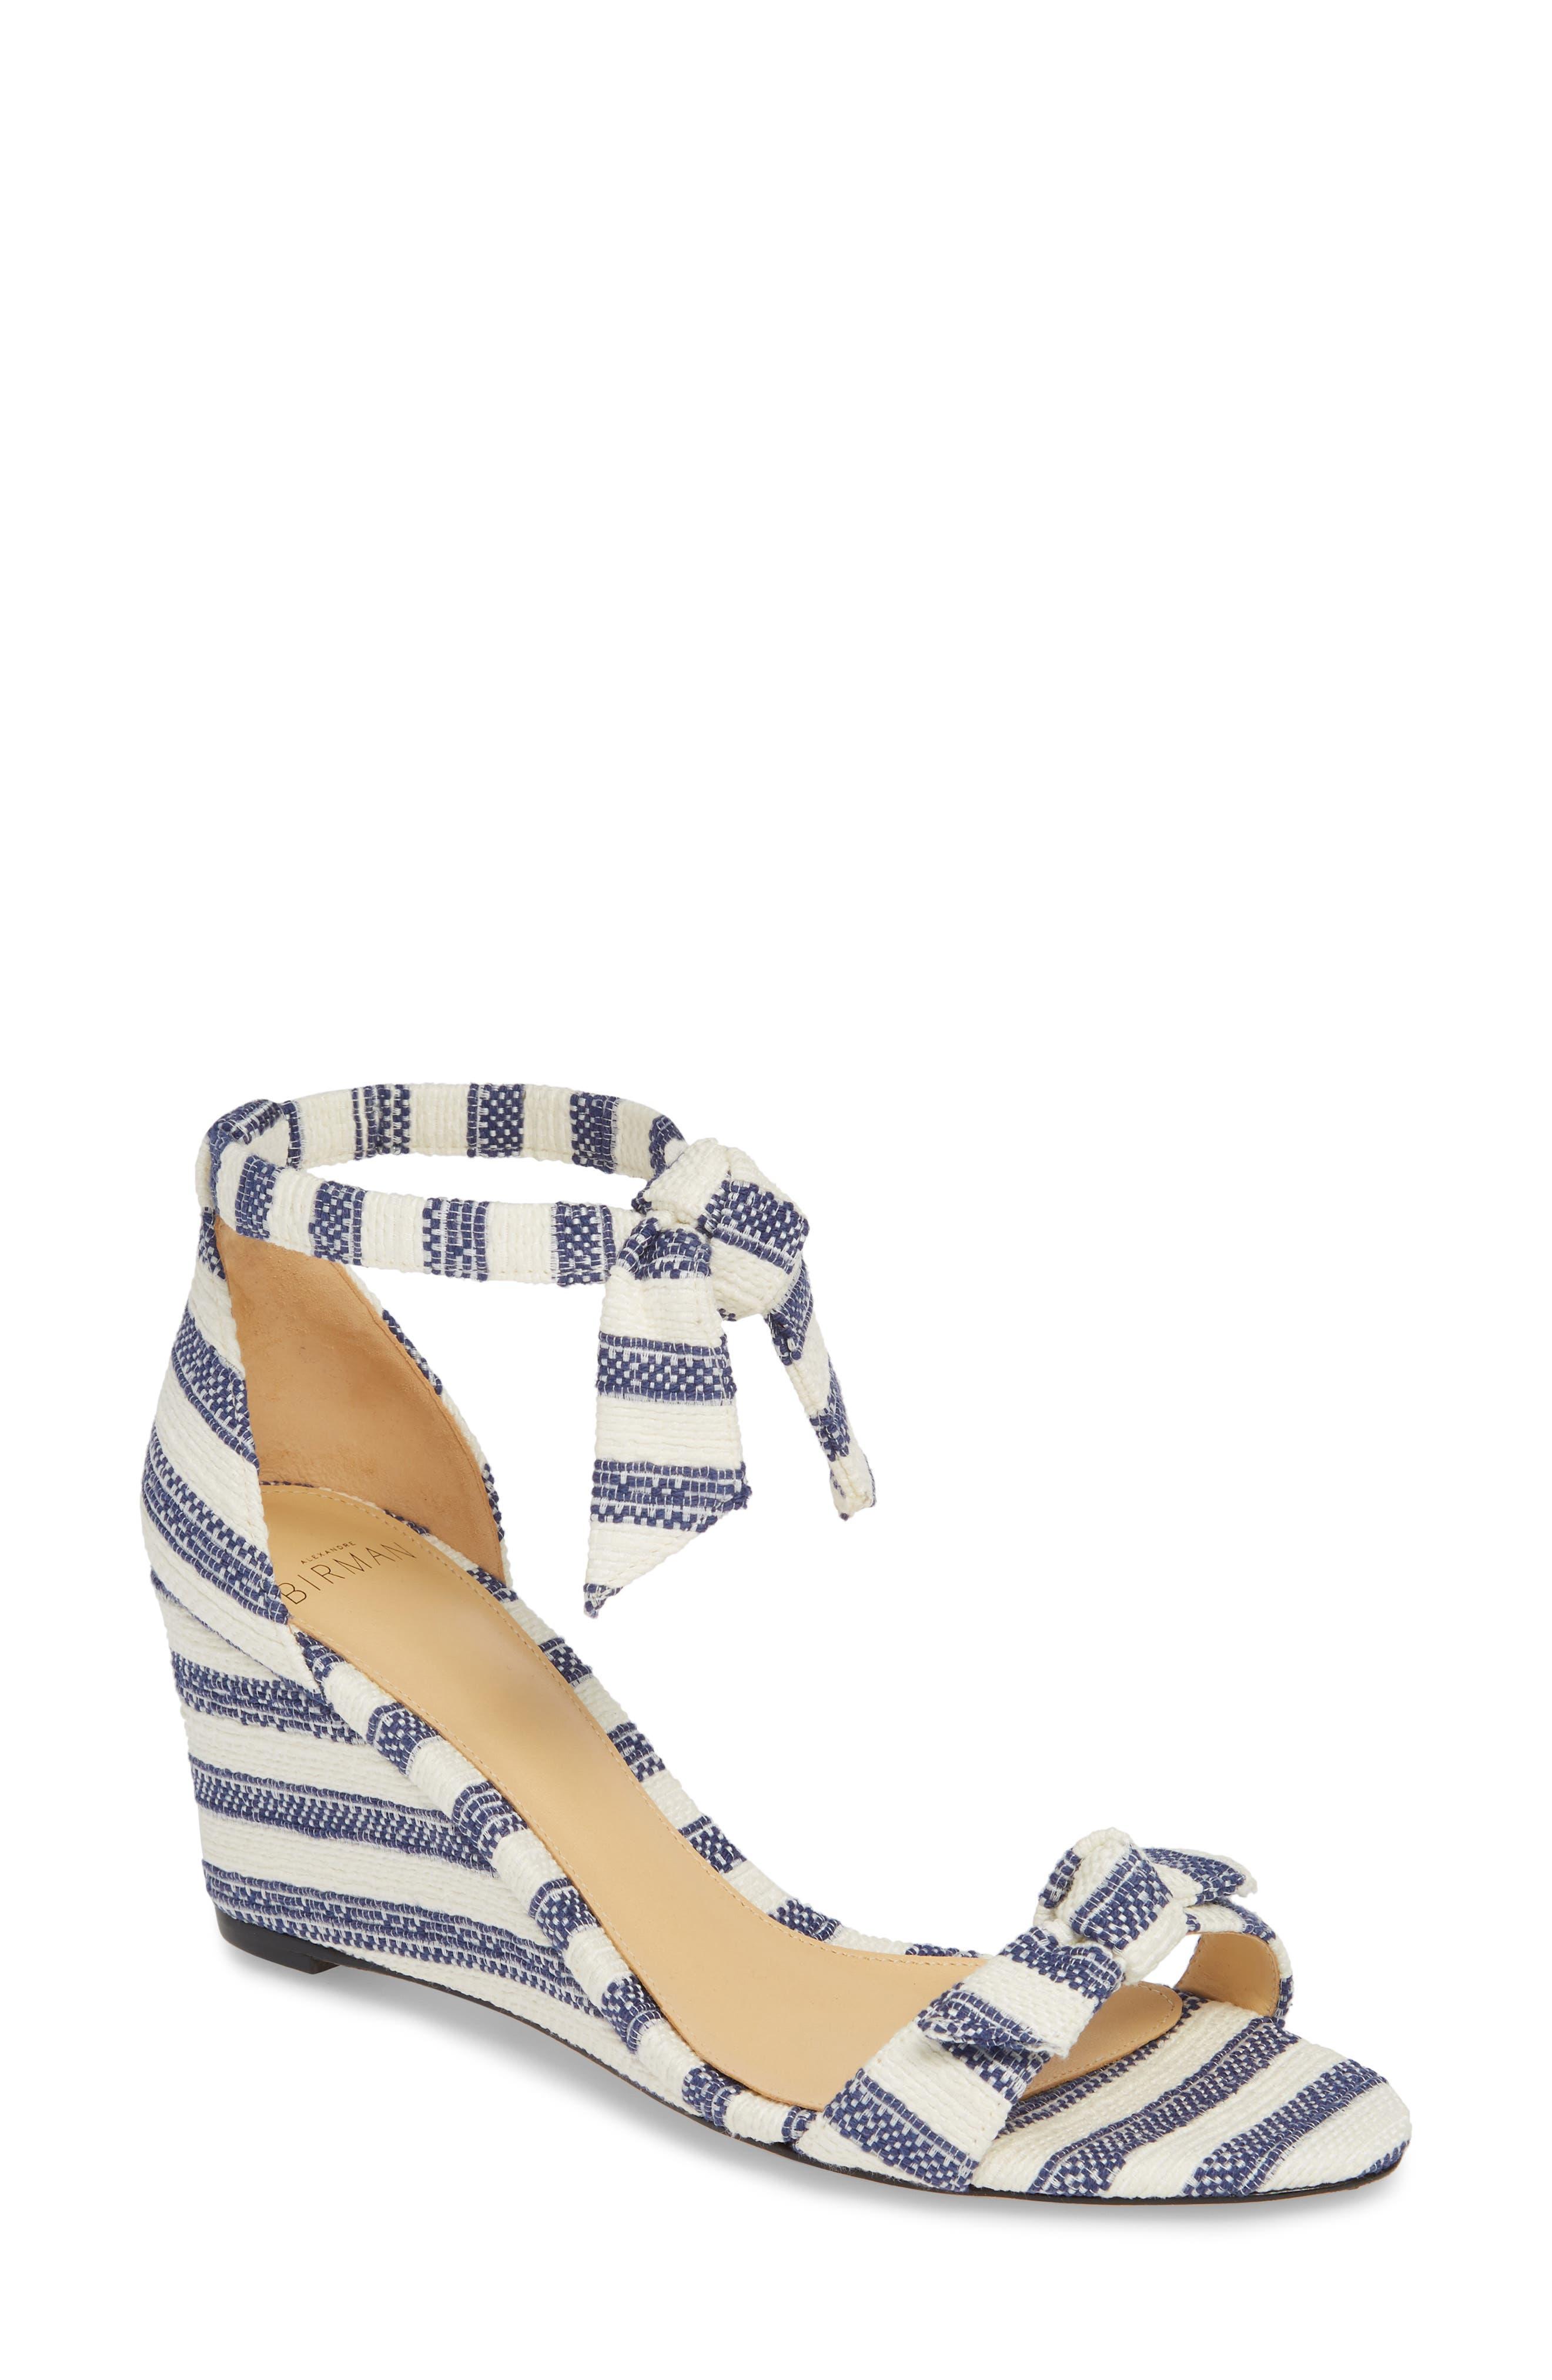 Alexandre Birman Clarita Wedge Sandal, Blue